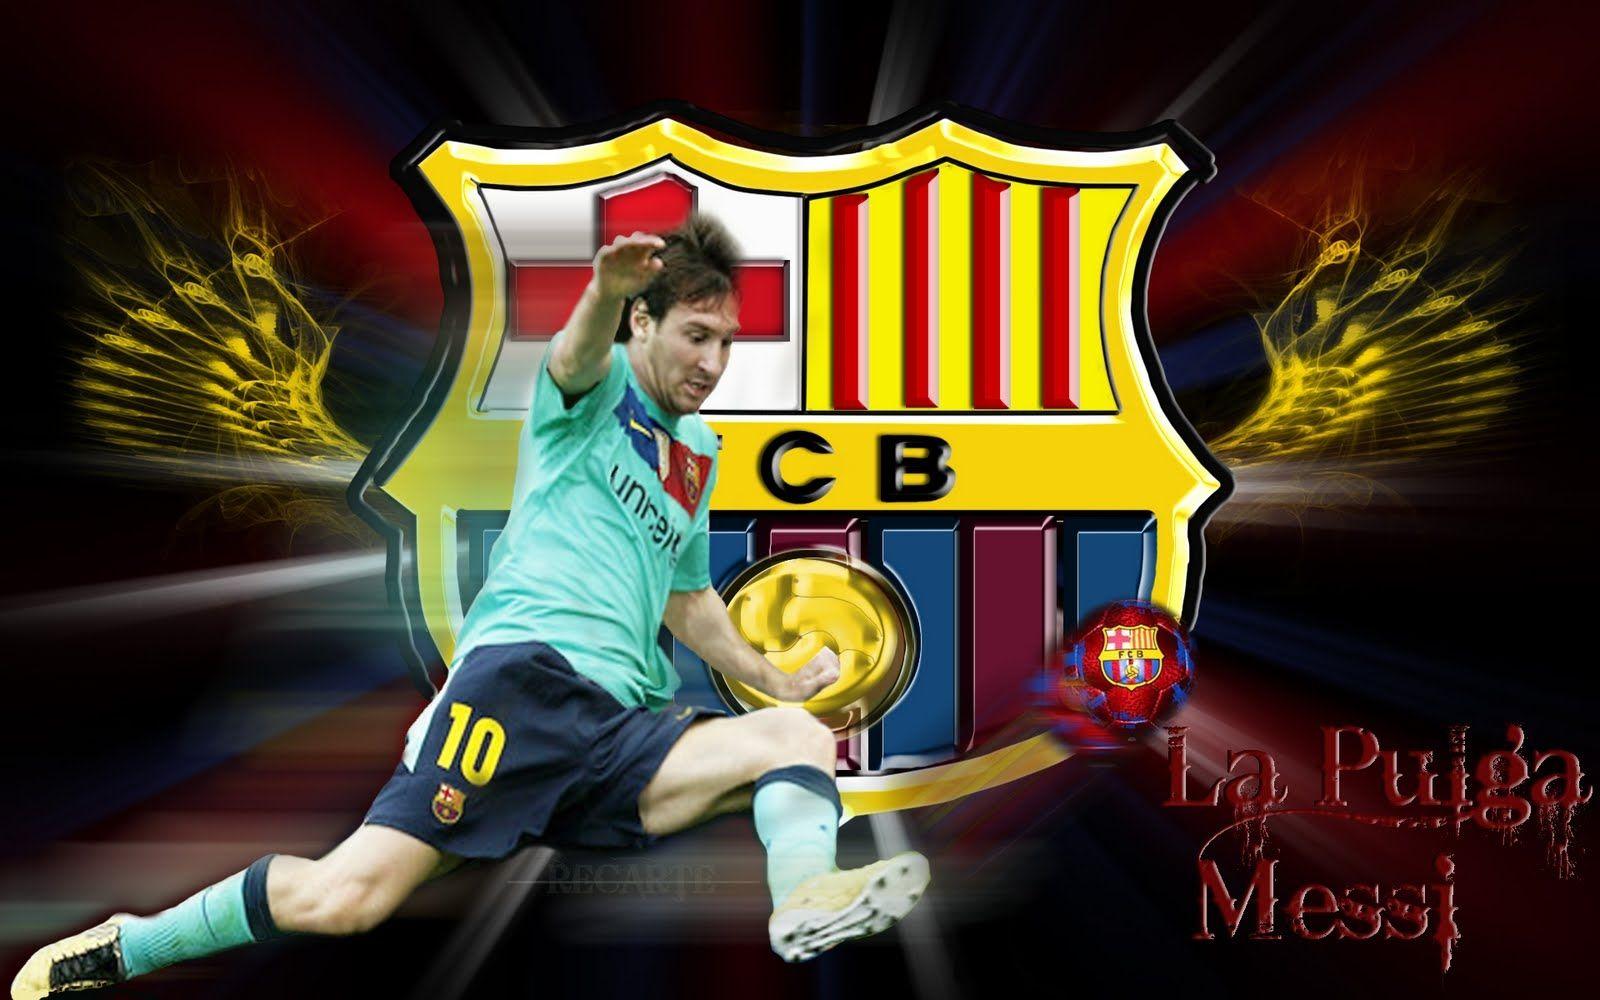 Lionel Messi Fcb Wallpaper Hd Lionel Messi Messi Messi Soccer